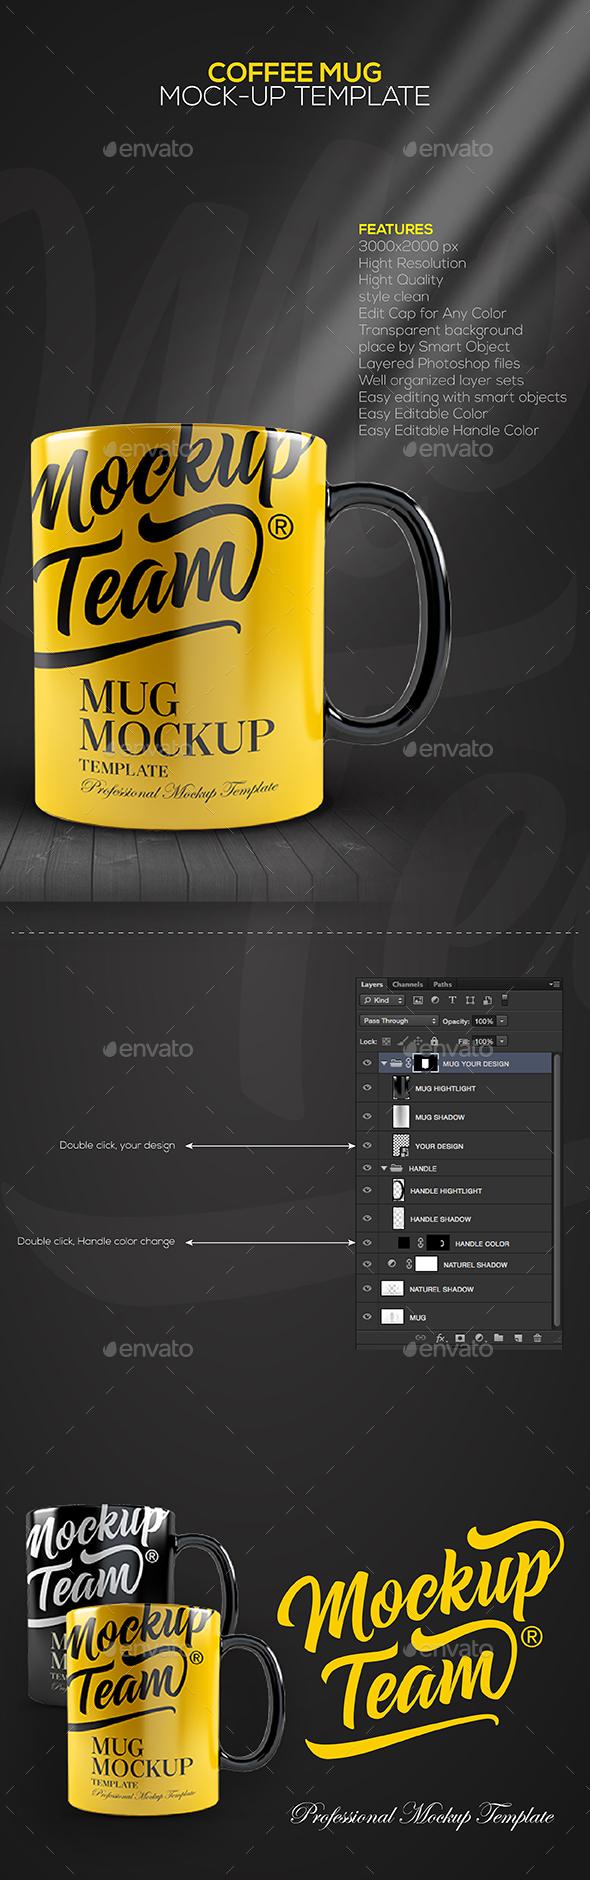 Coffee Mug Mock-up Template